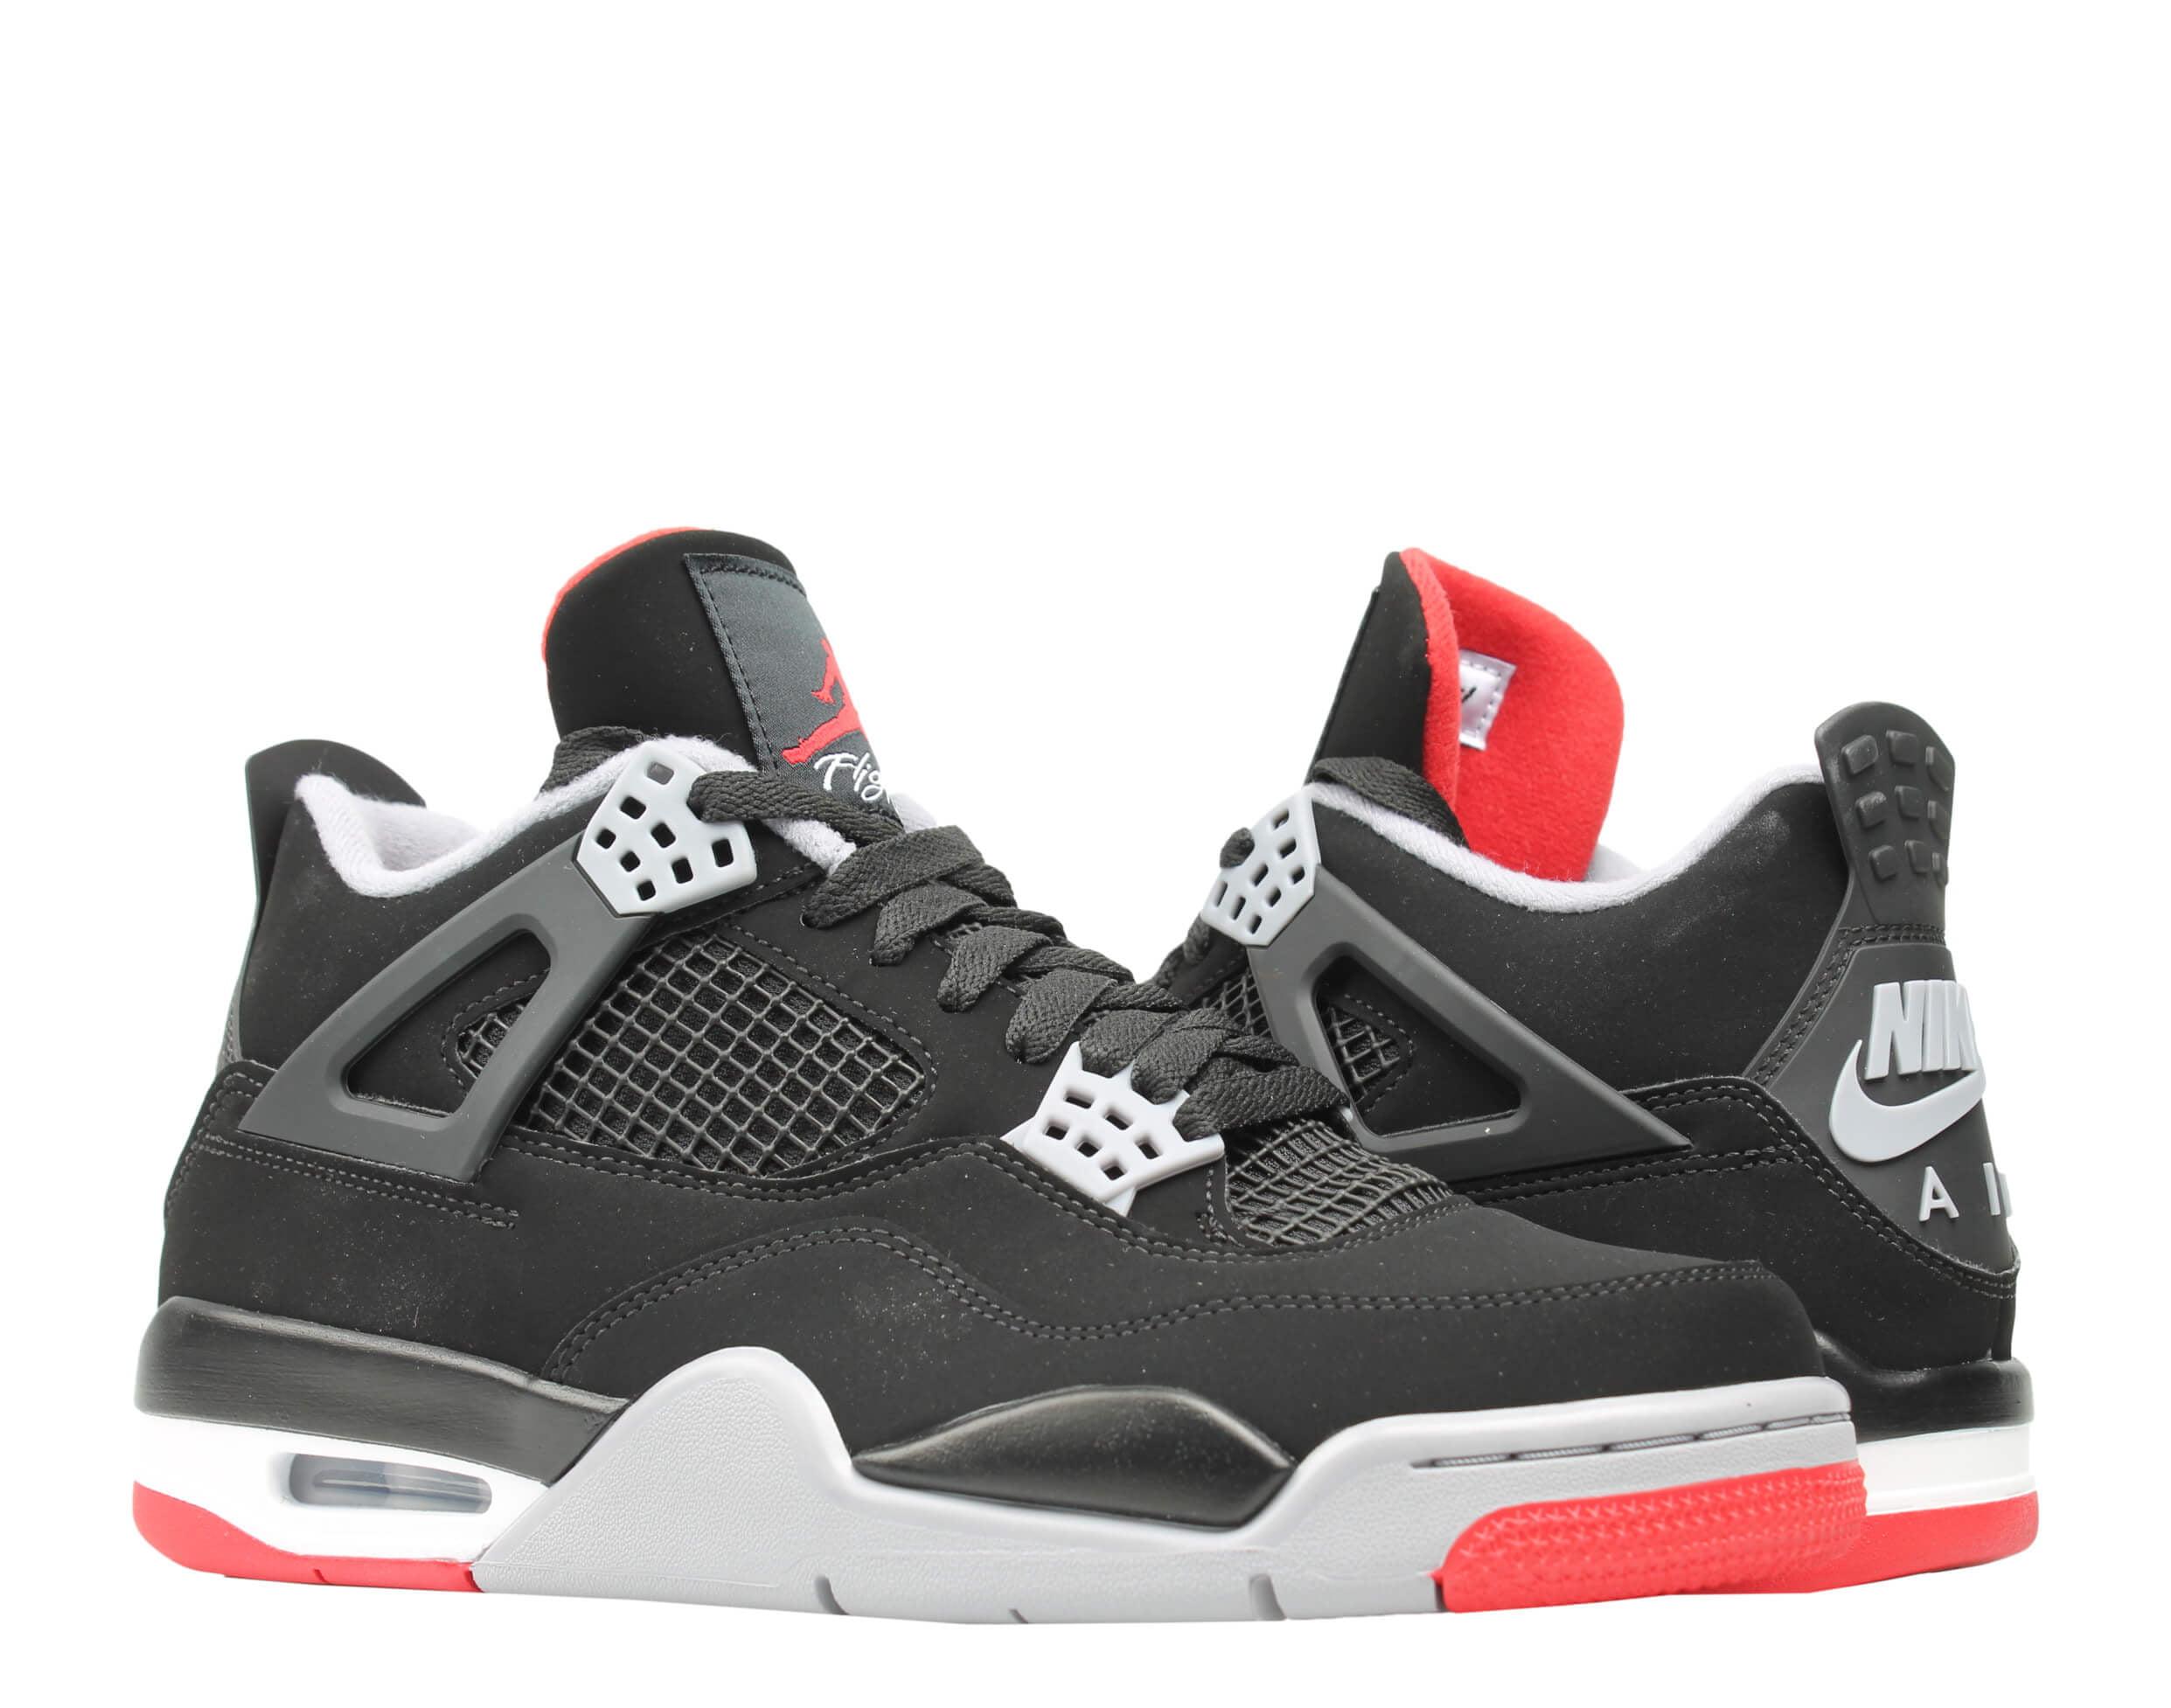 Jordan - Nike Air Jordan 4 Retro Bred